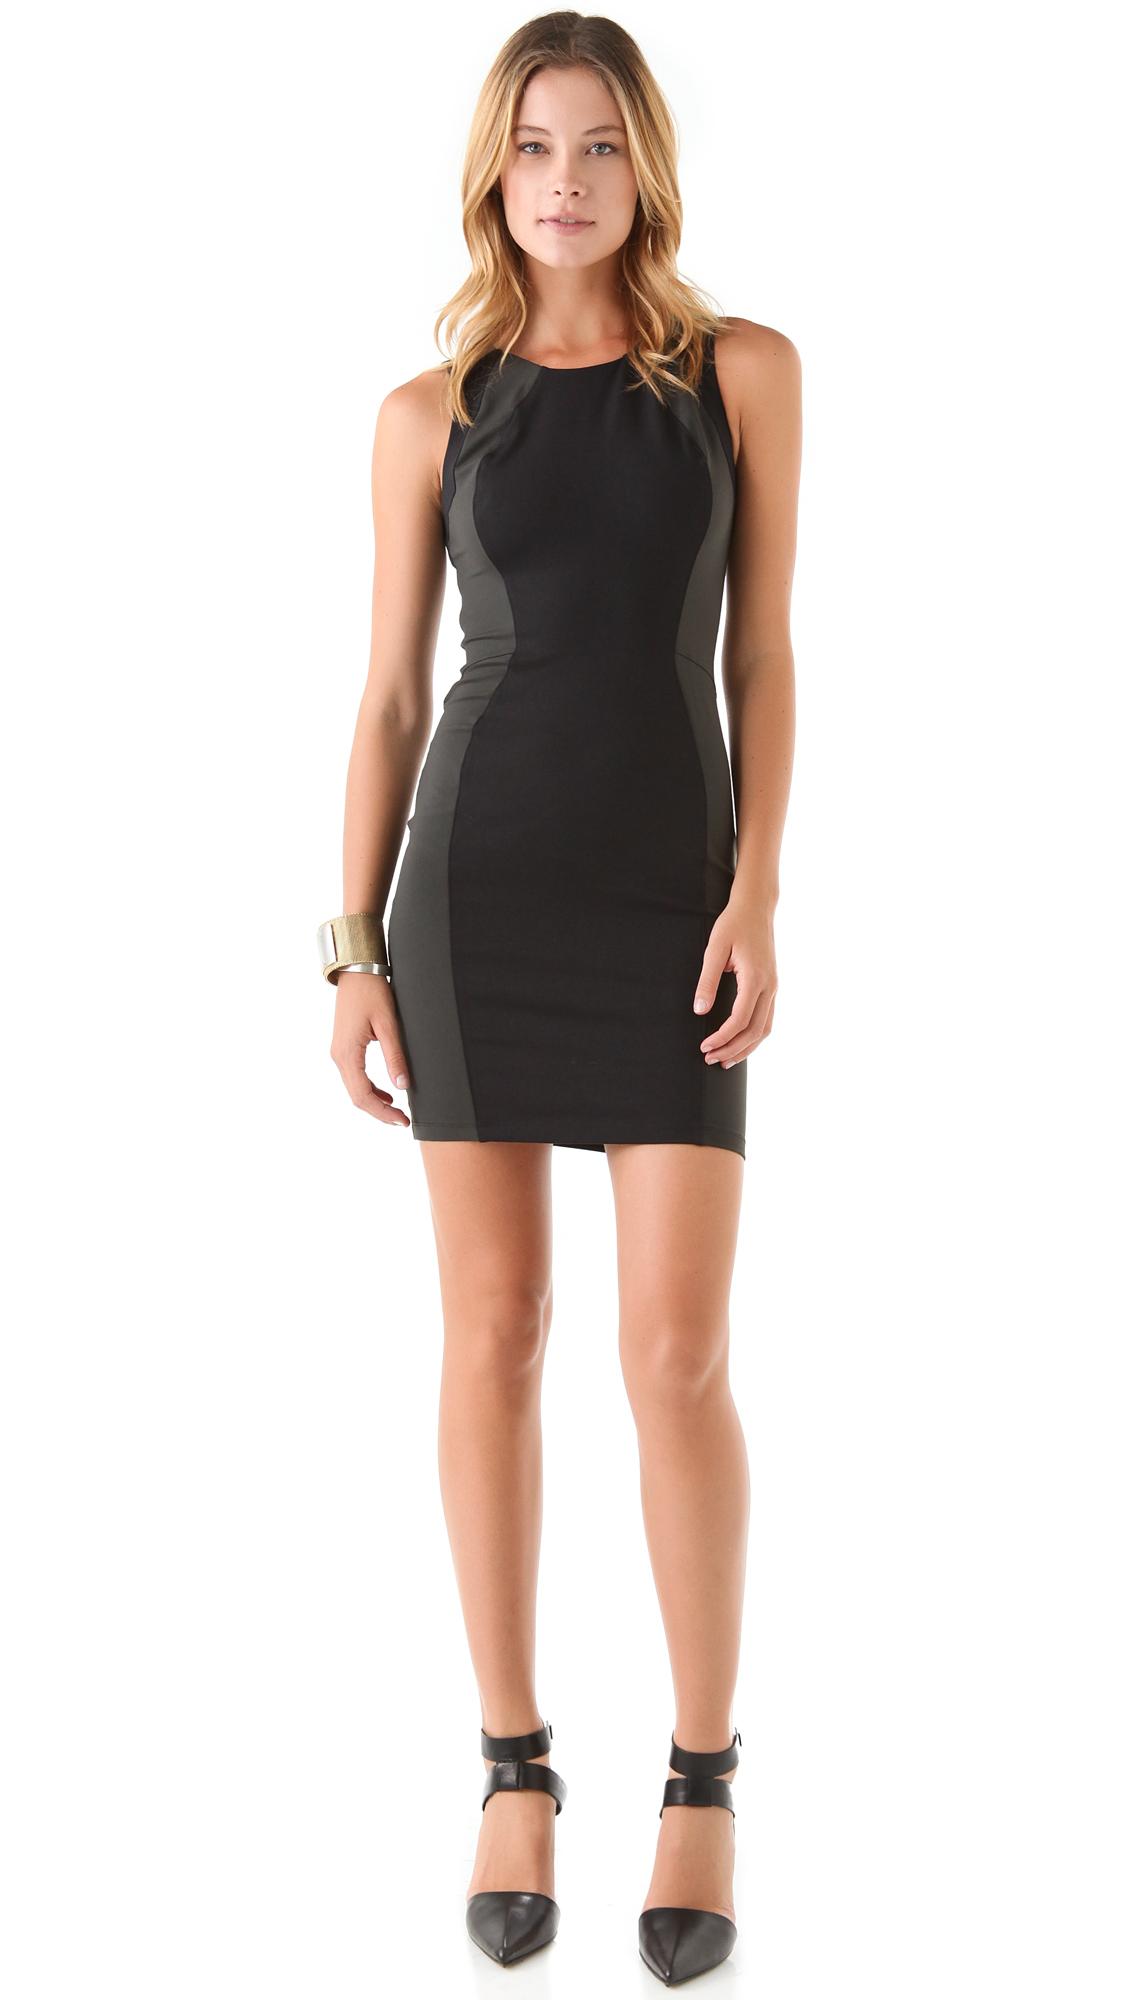 Sleeveless Mini Dresses